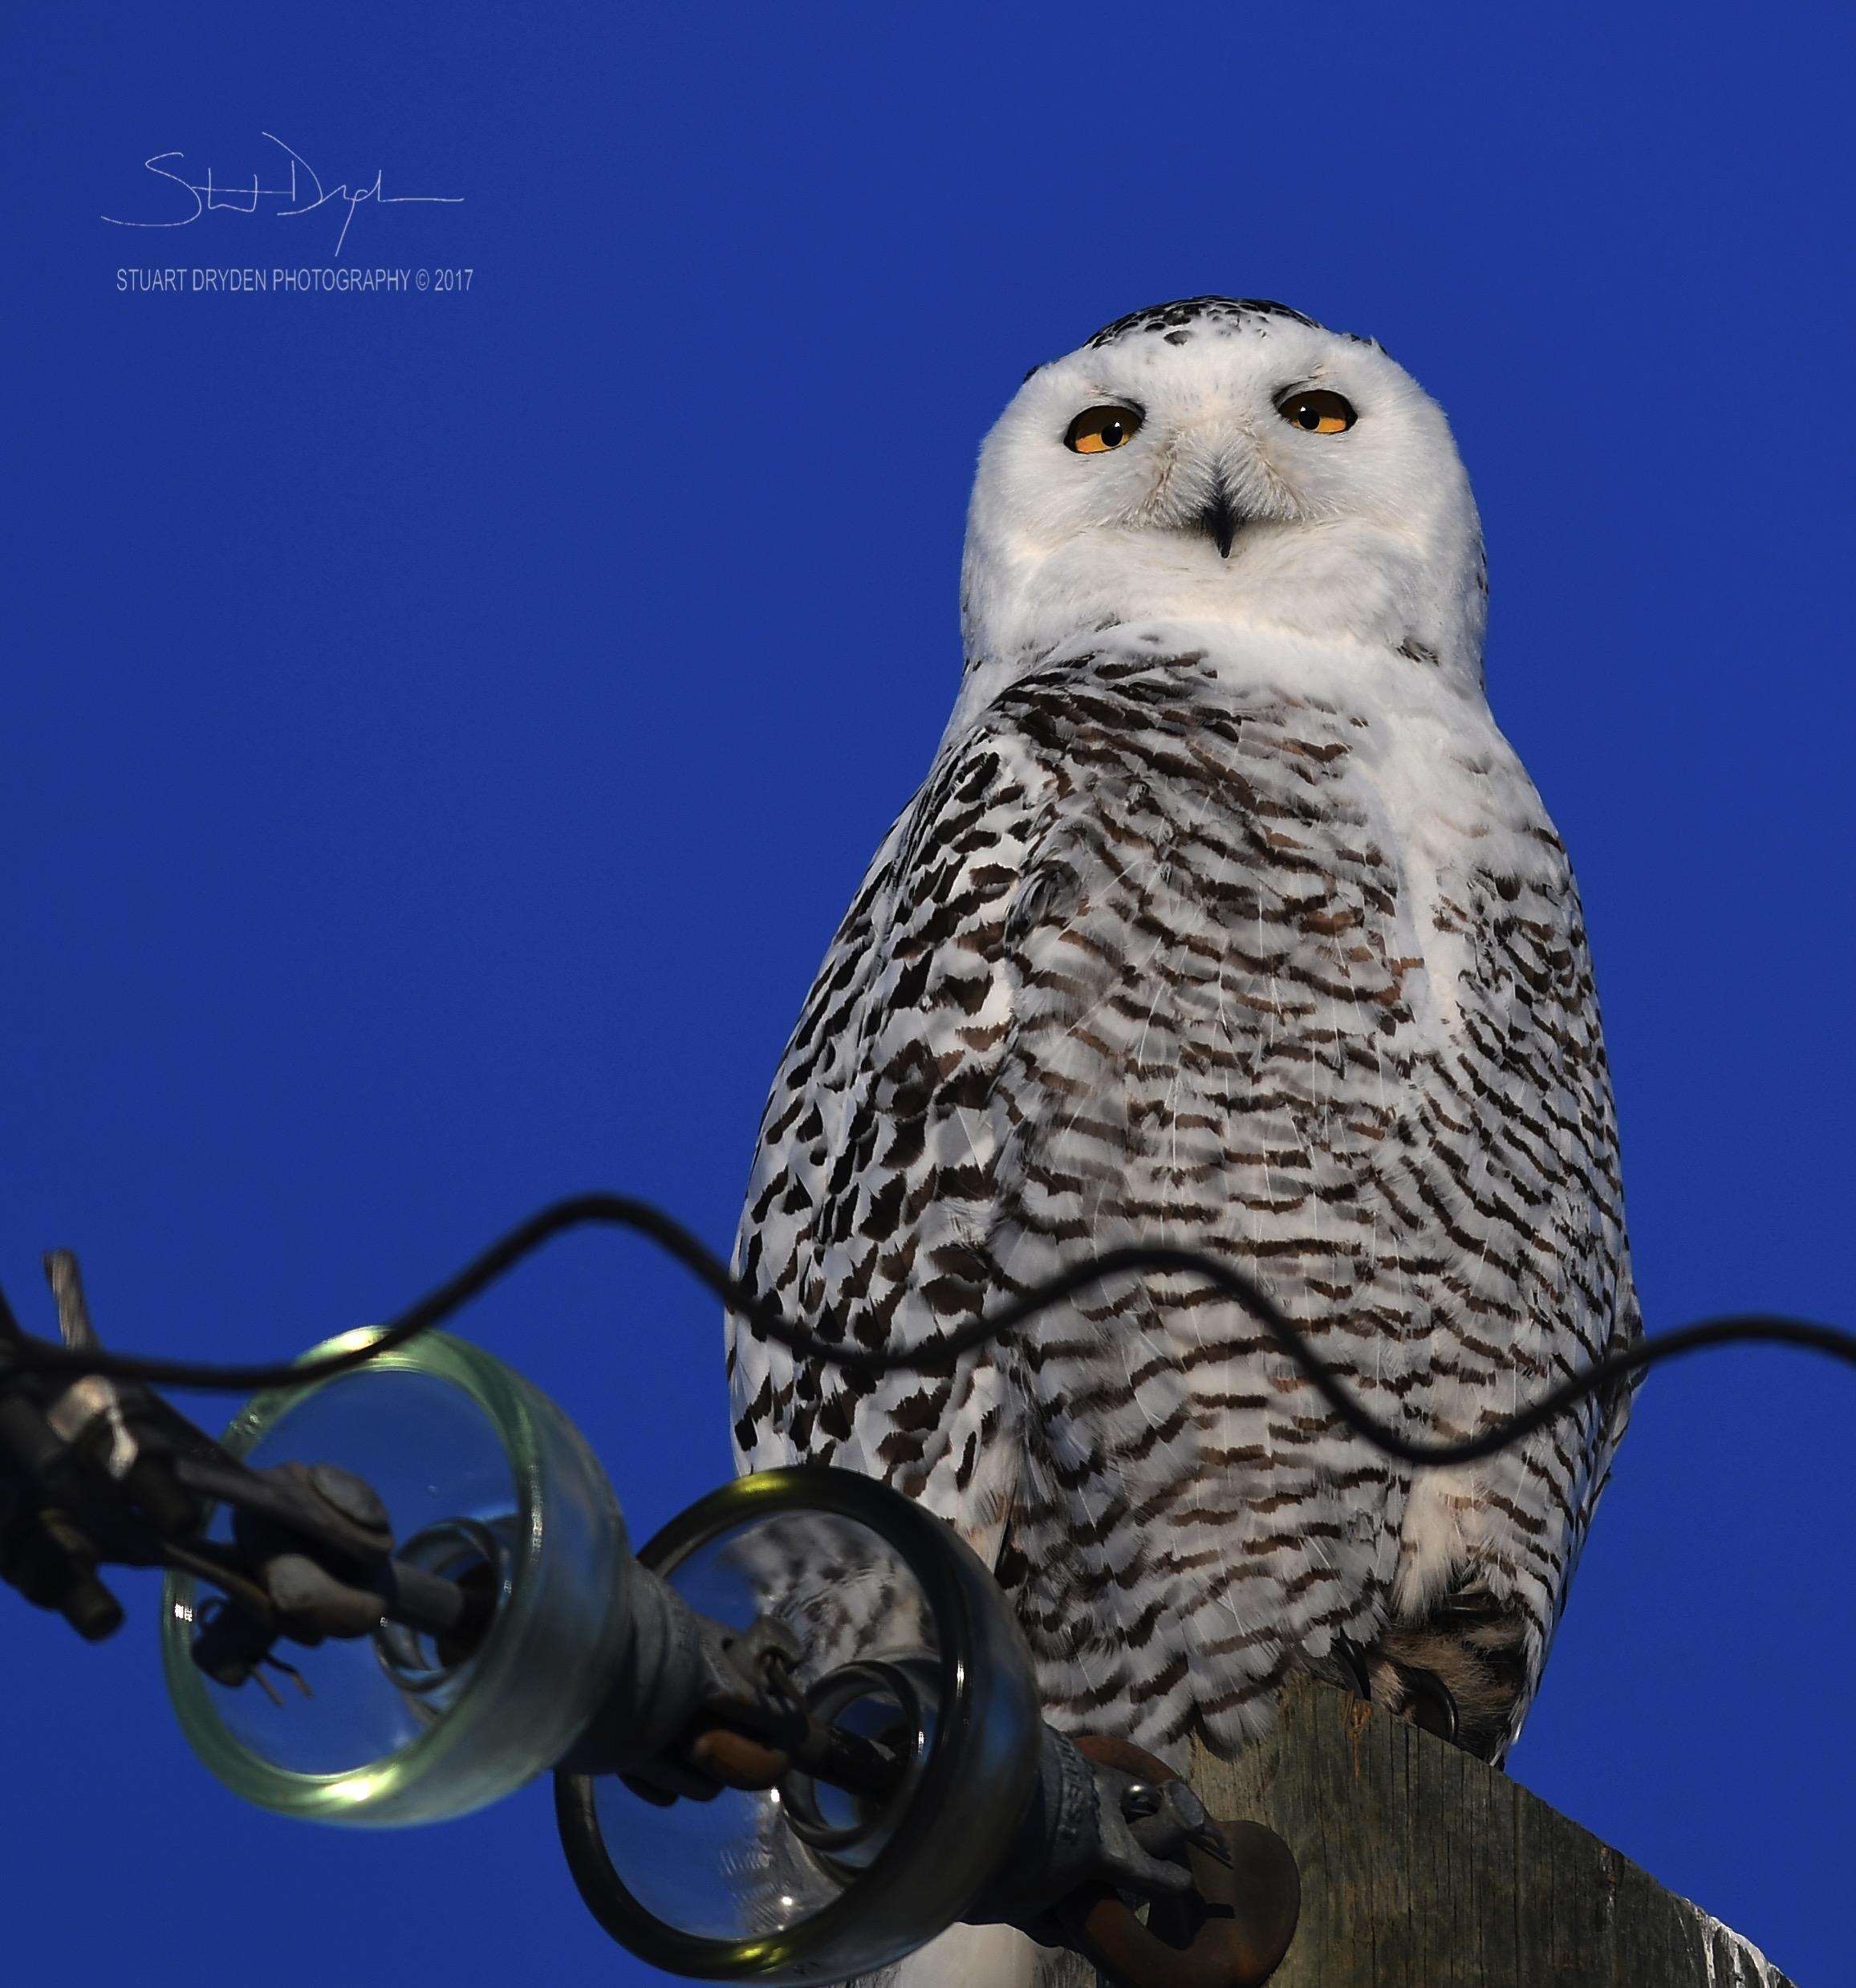 mount-sunset-snowy-owl-jan25-170067.jpg